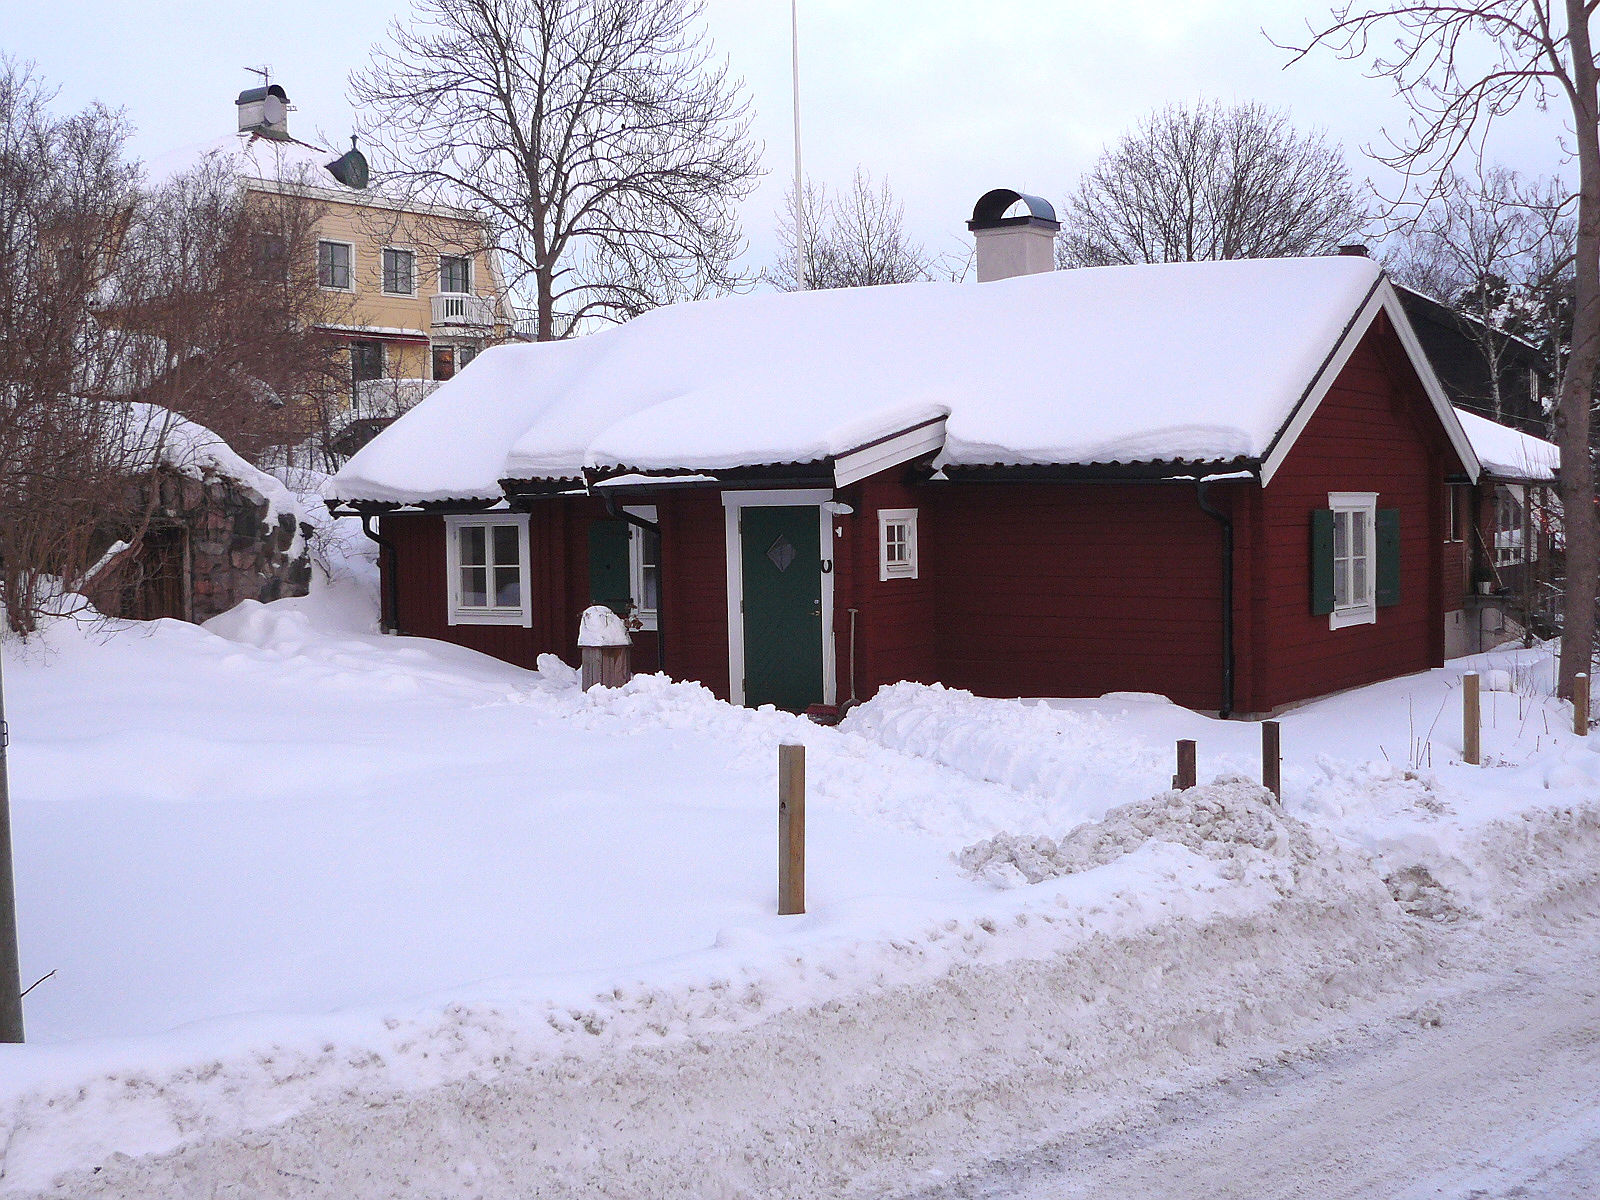 1800-tals torp i naturreservat - Houses for Rent in Brsarp